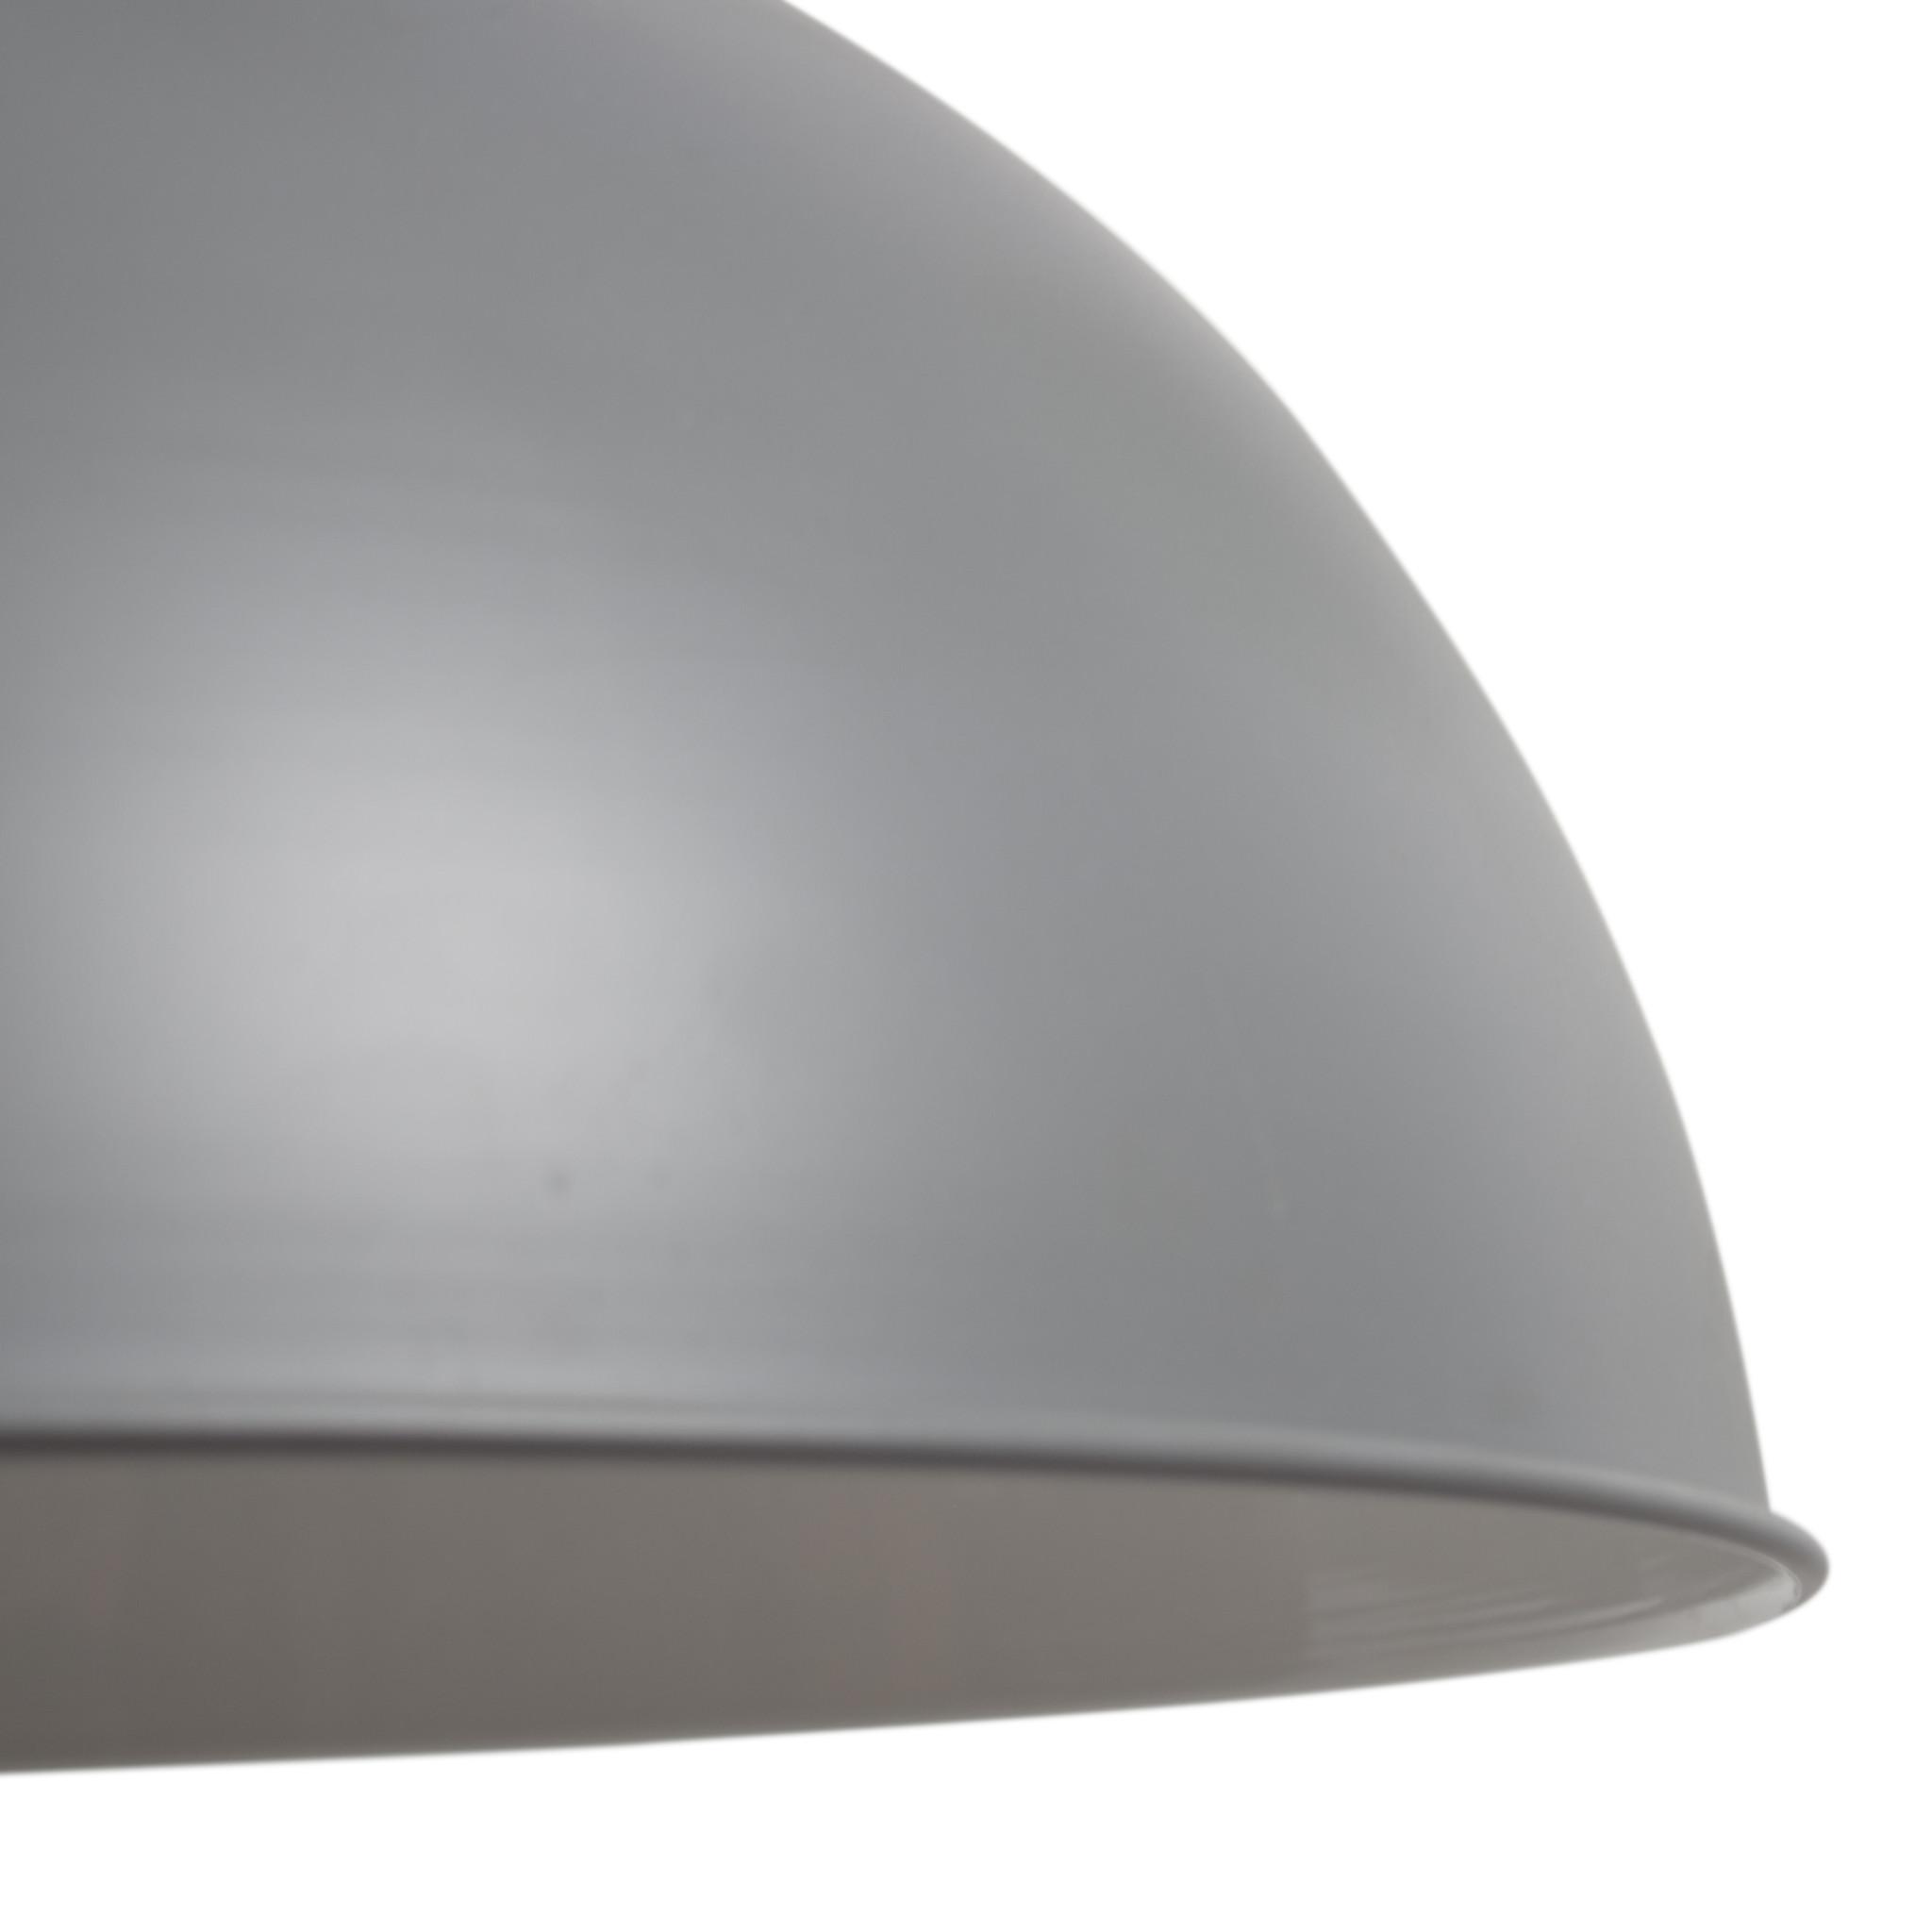 Urban Interiors Urban Interiors Hanglamp Dome XL ø50cm. stone grey-AI-PL-13-SG-8719325005066